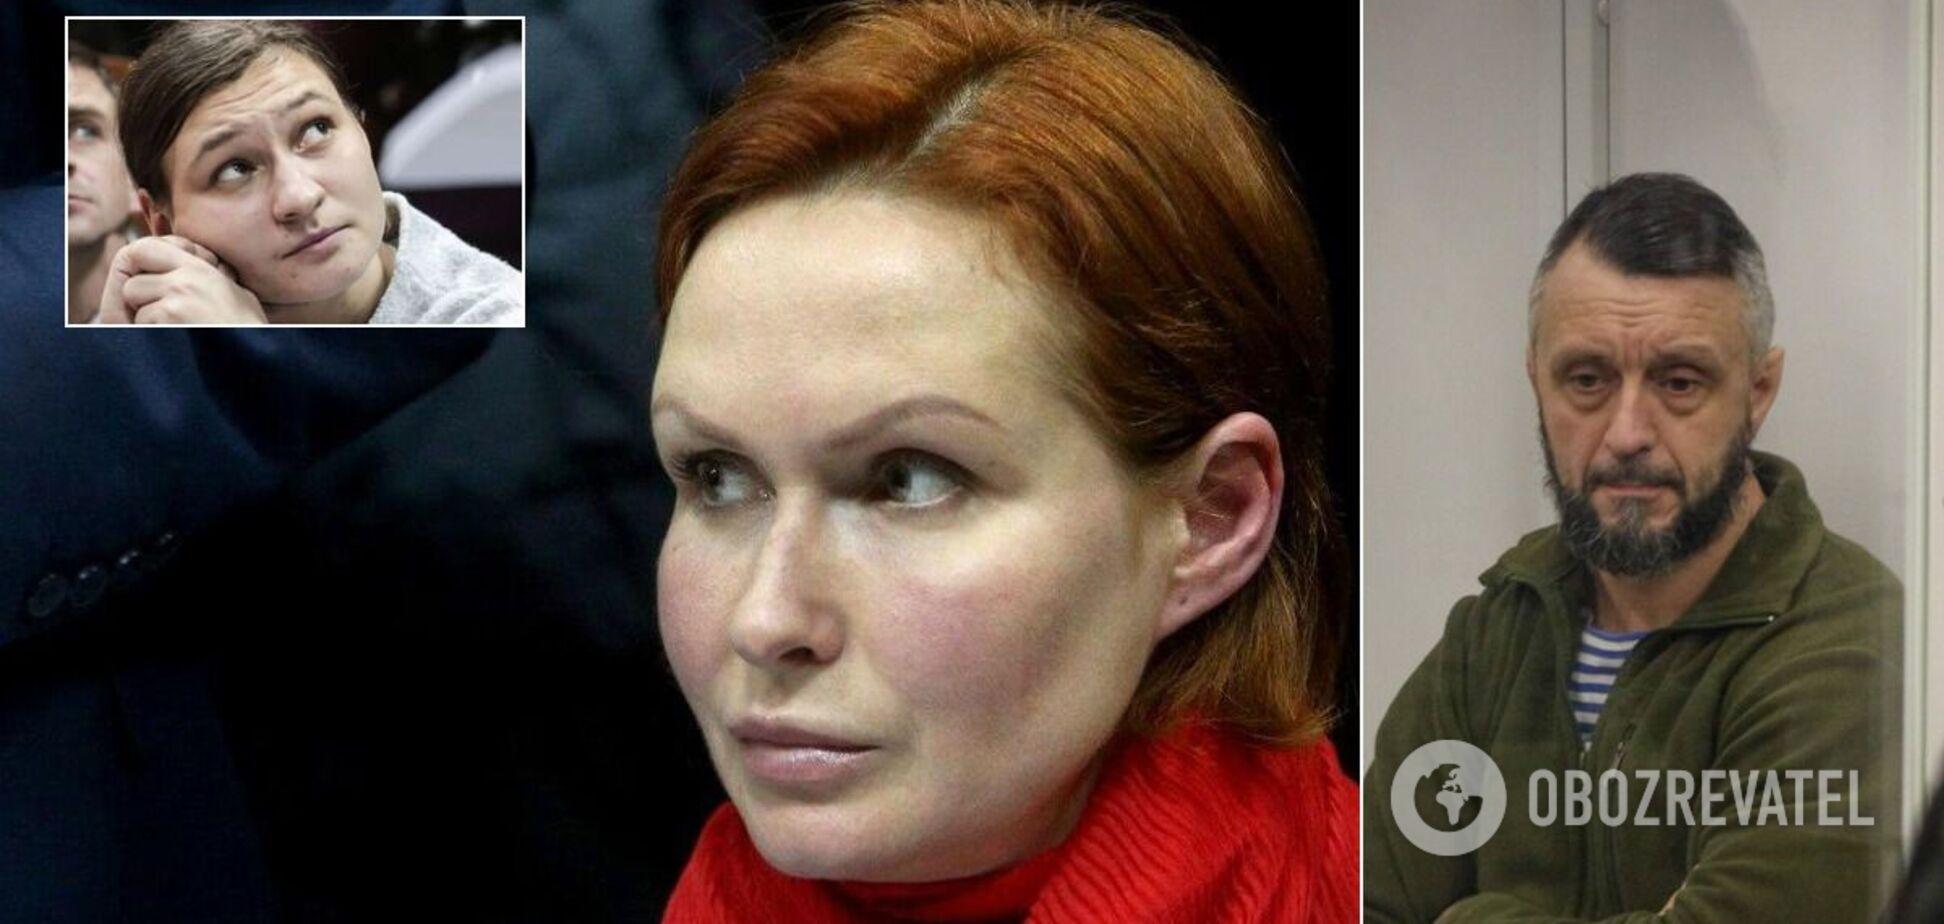 Дугар, Антоненку та Кузьменко обрано запобіжний захід